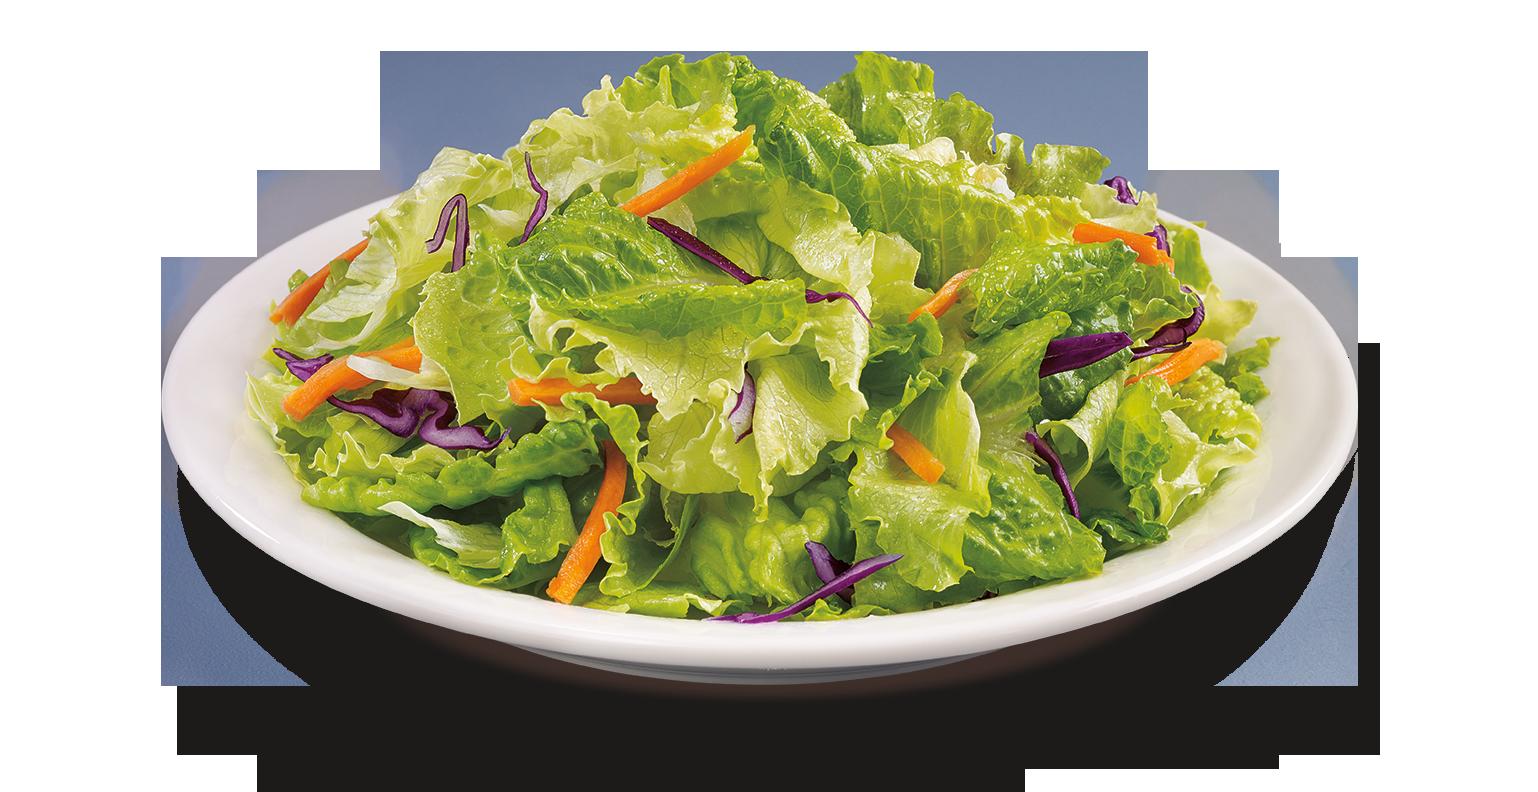 High Resolution Wallpaper | Salad 1538x792 px